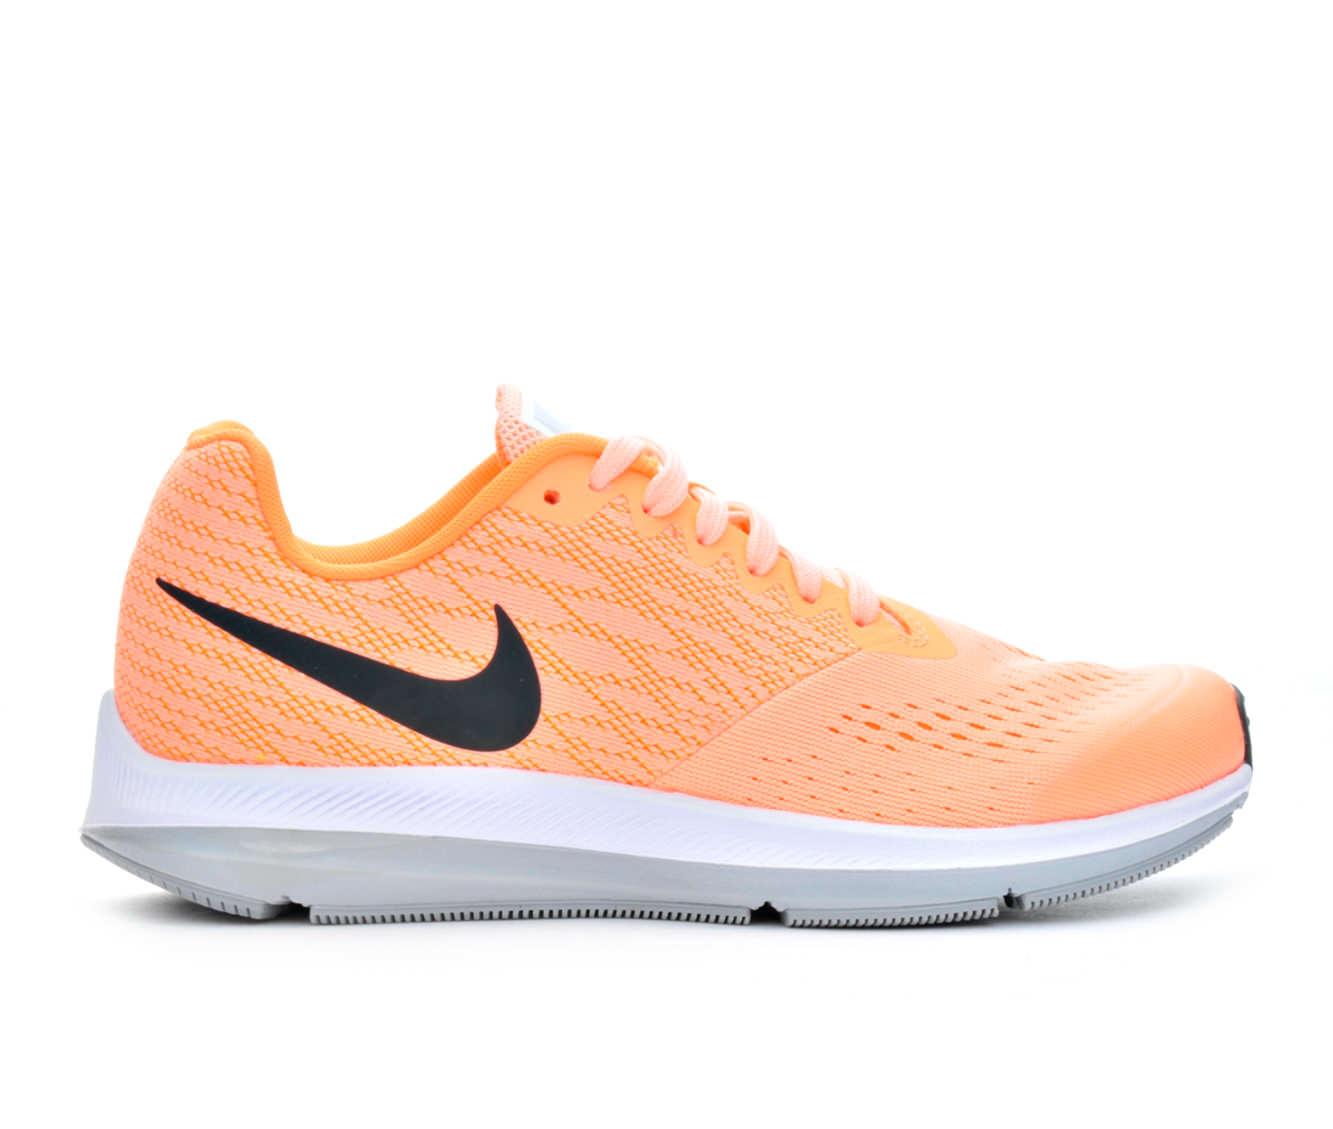 Girls' Nike Zoom Winflo 4 Running Shoes (Orange)